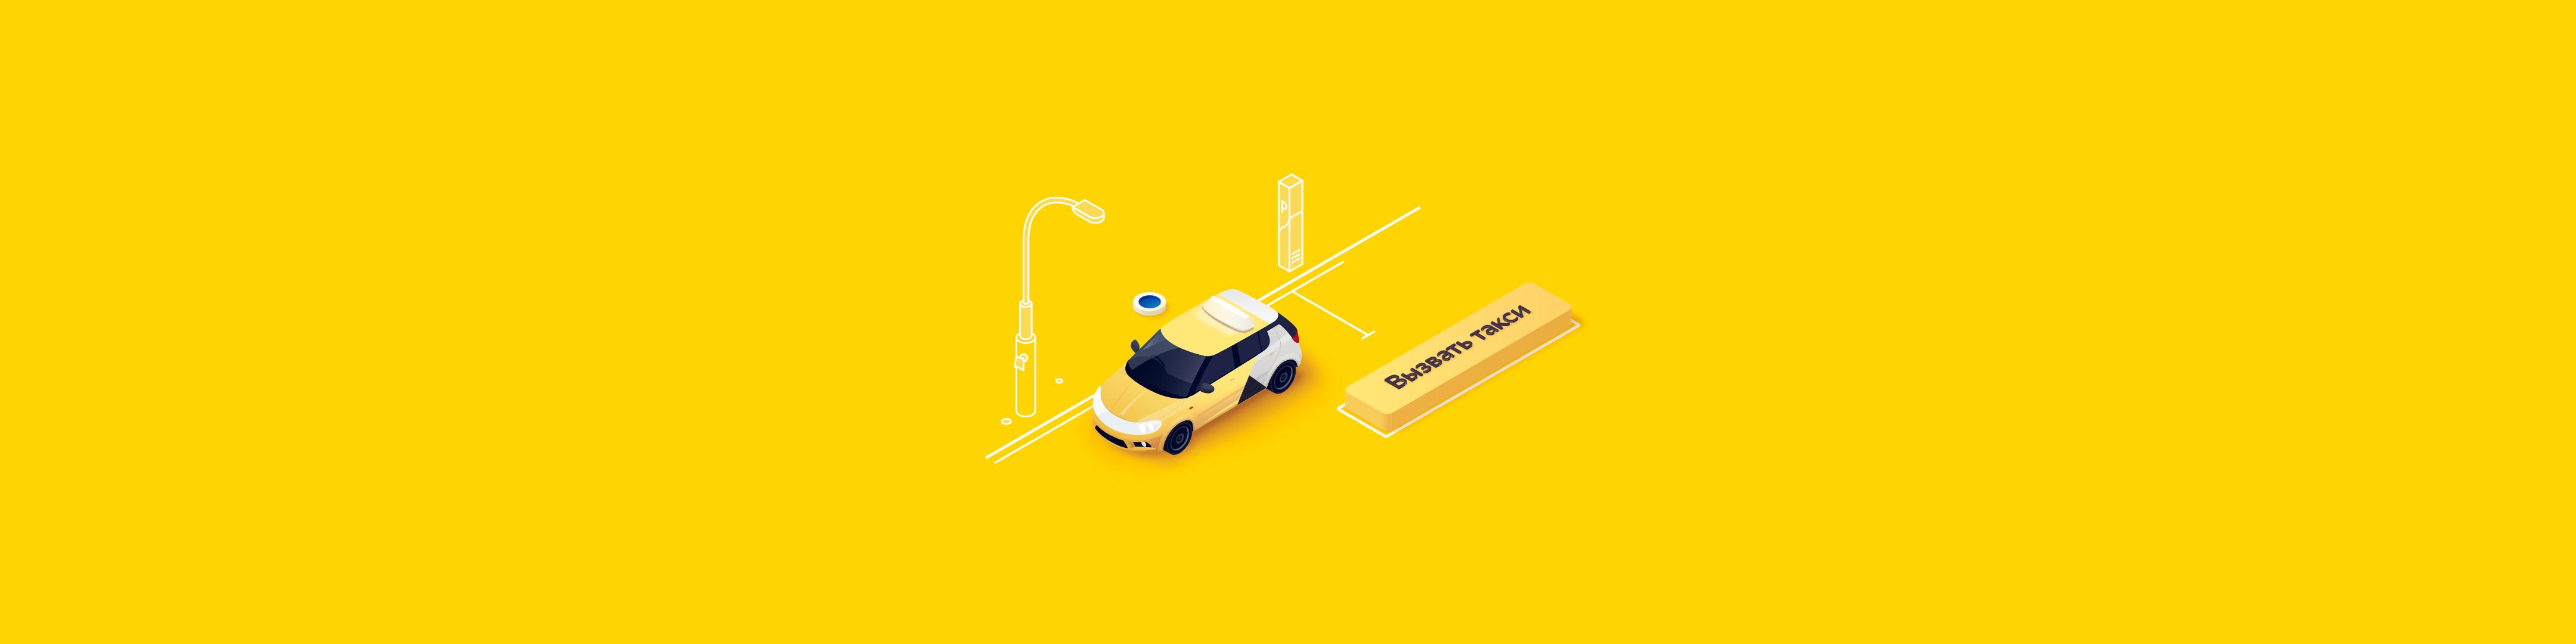 Yandex Taxi - Revenue & Download estimates - Apple App Store - US